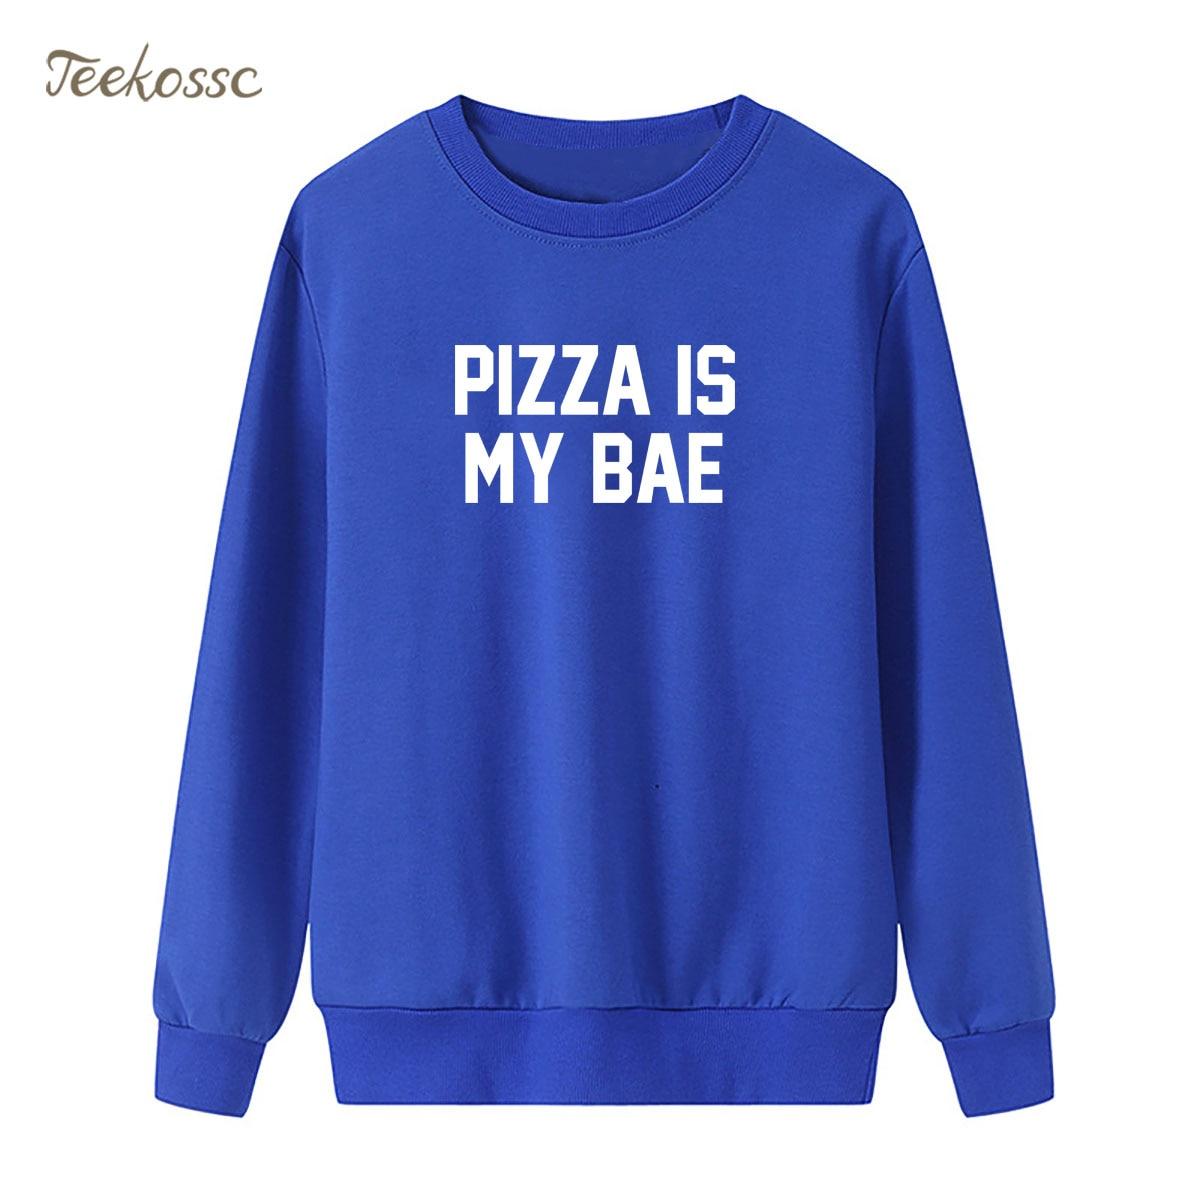 Pizza Is My Bae Sweatshirts Womens Hoodie 2018 New Brand Winter Autumn Lady Pullover Loose Fleece Blue Sportswear Brand Clothing